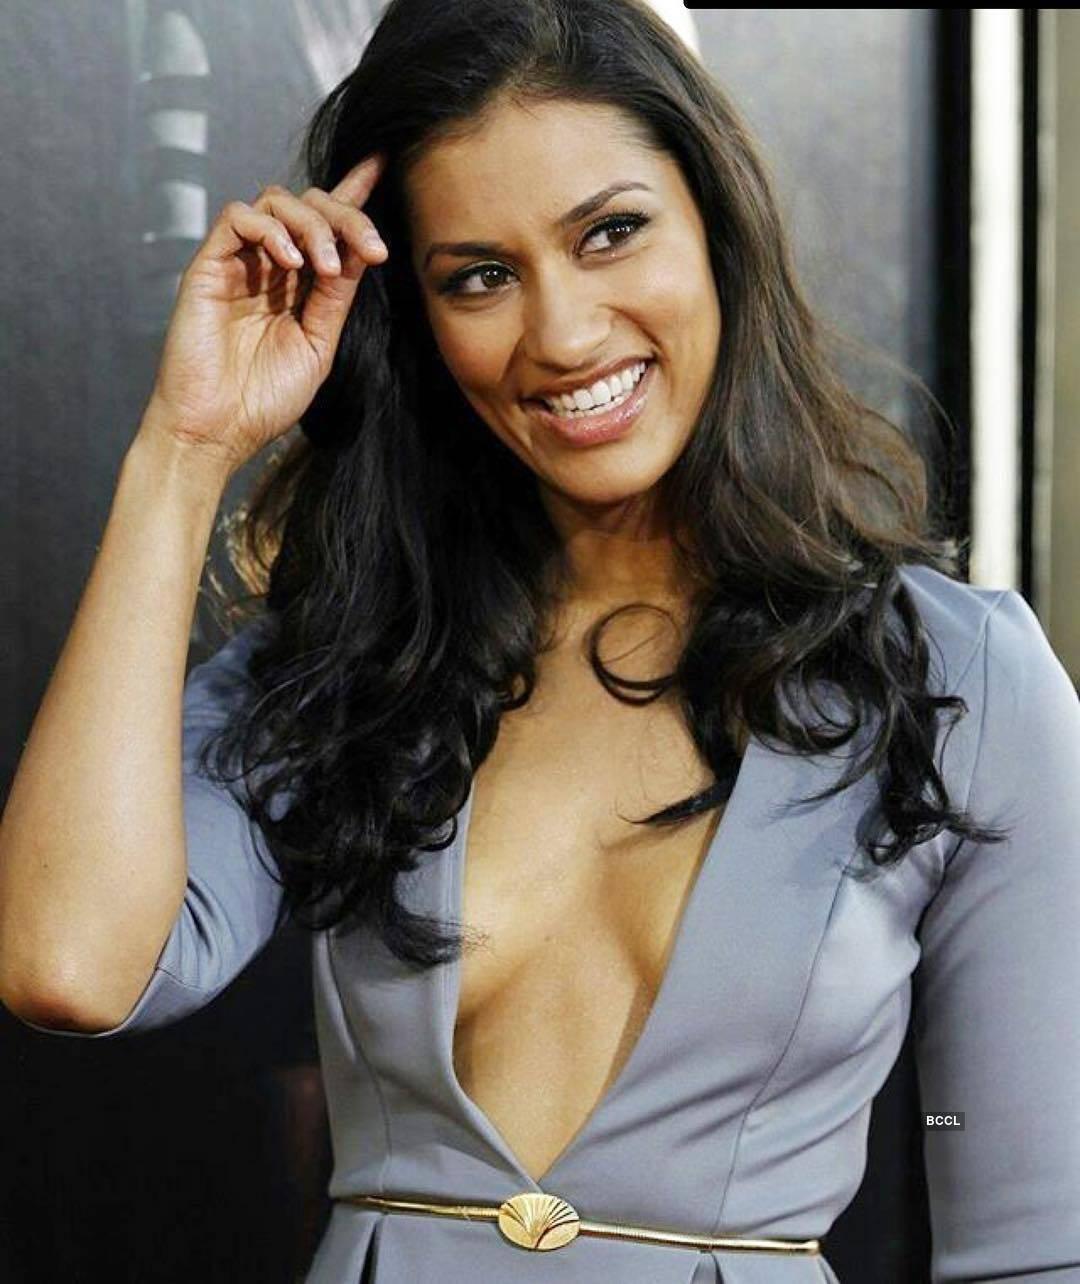 Meghan Markle's friend Janina Gavankar had no designers for the wedding